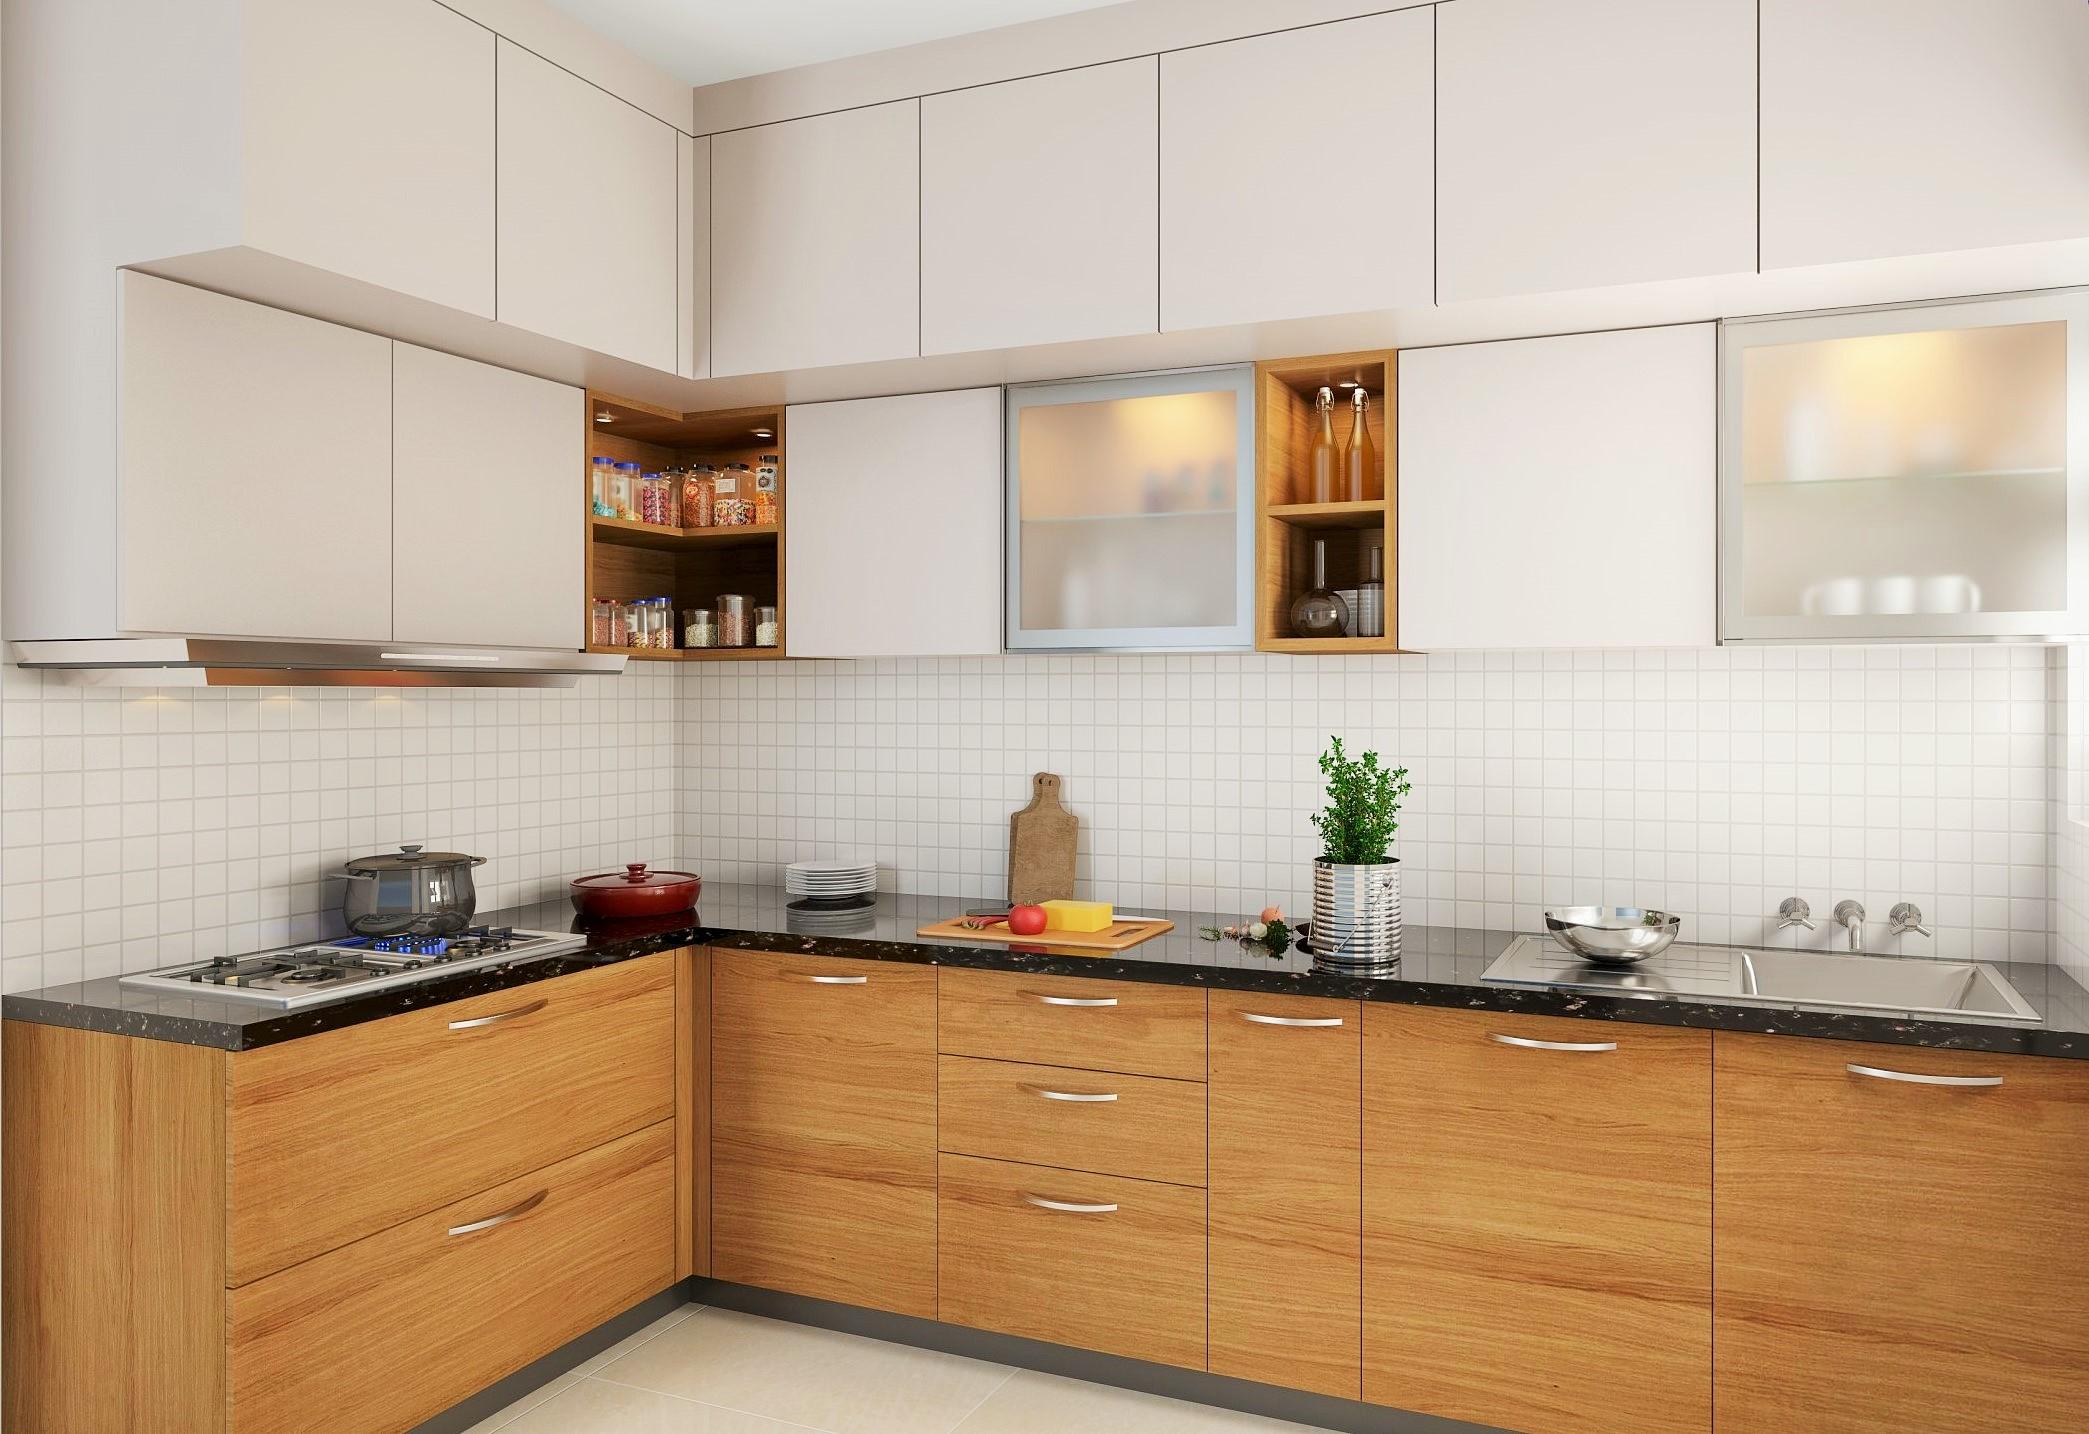 13 small kitchen design ideas that make